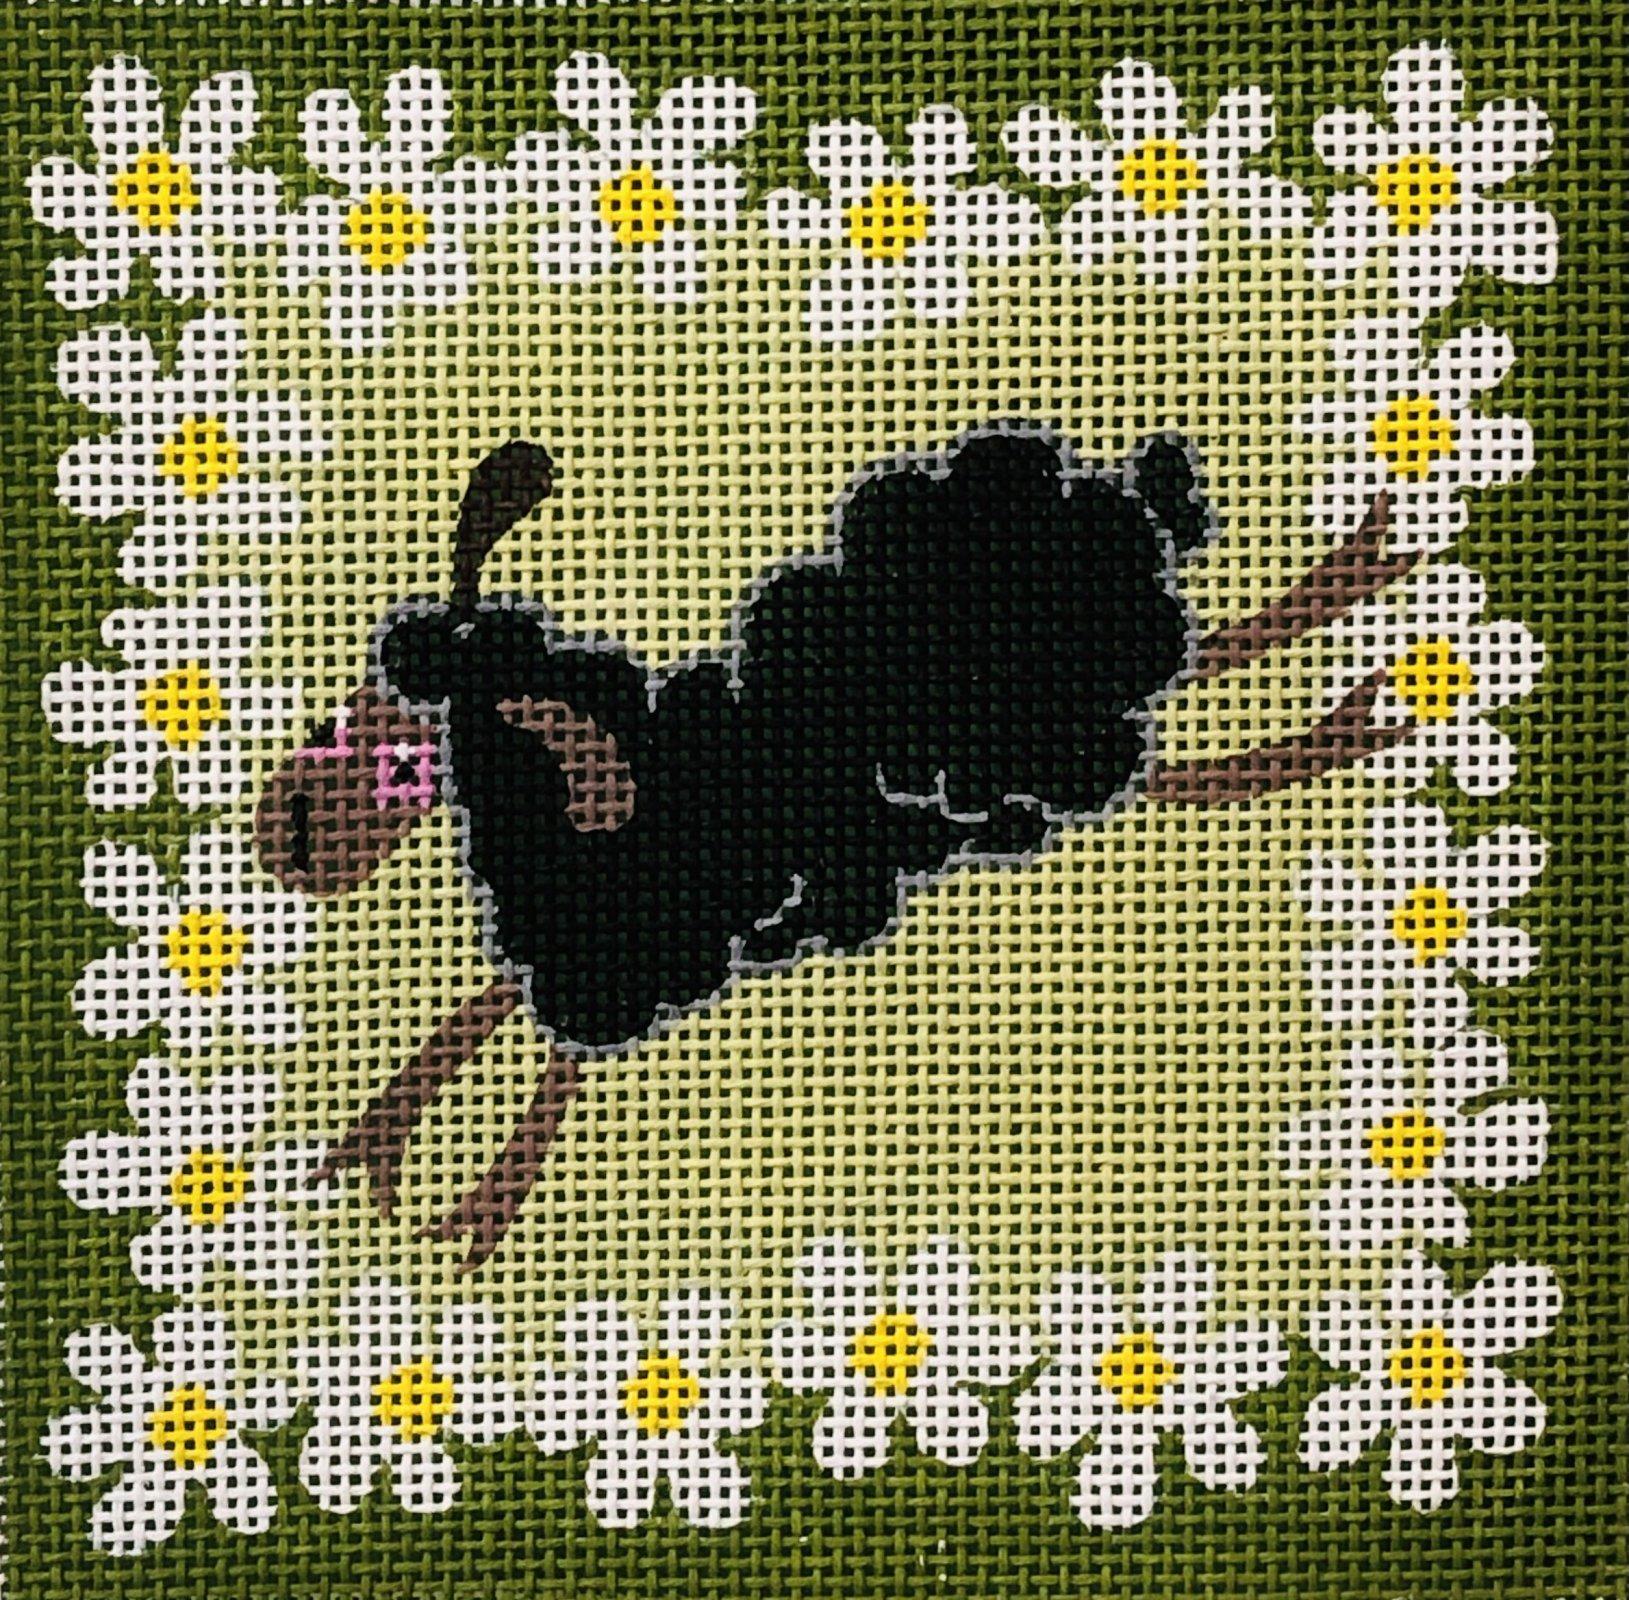 PC-Sheep with Flowers II 6x6